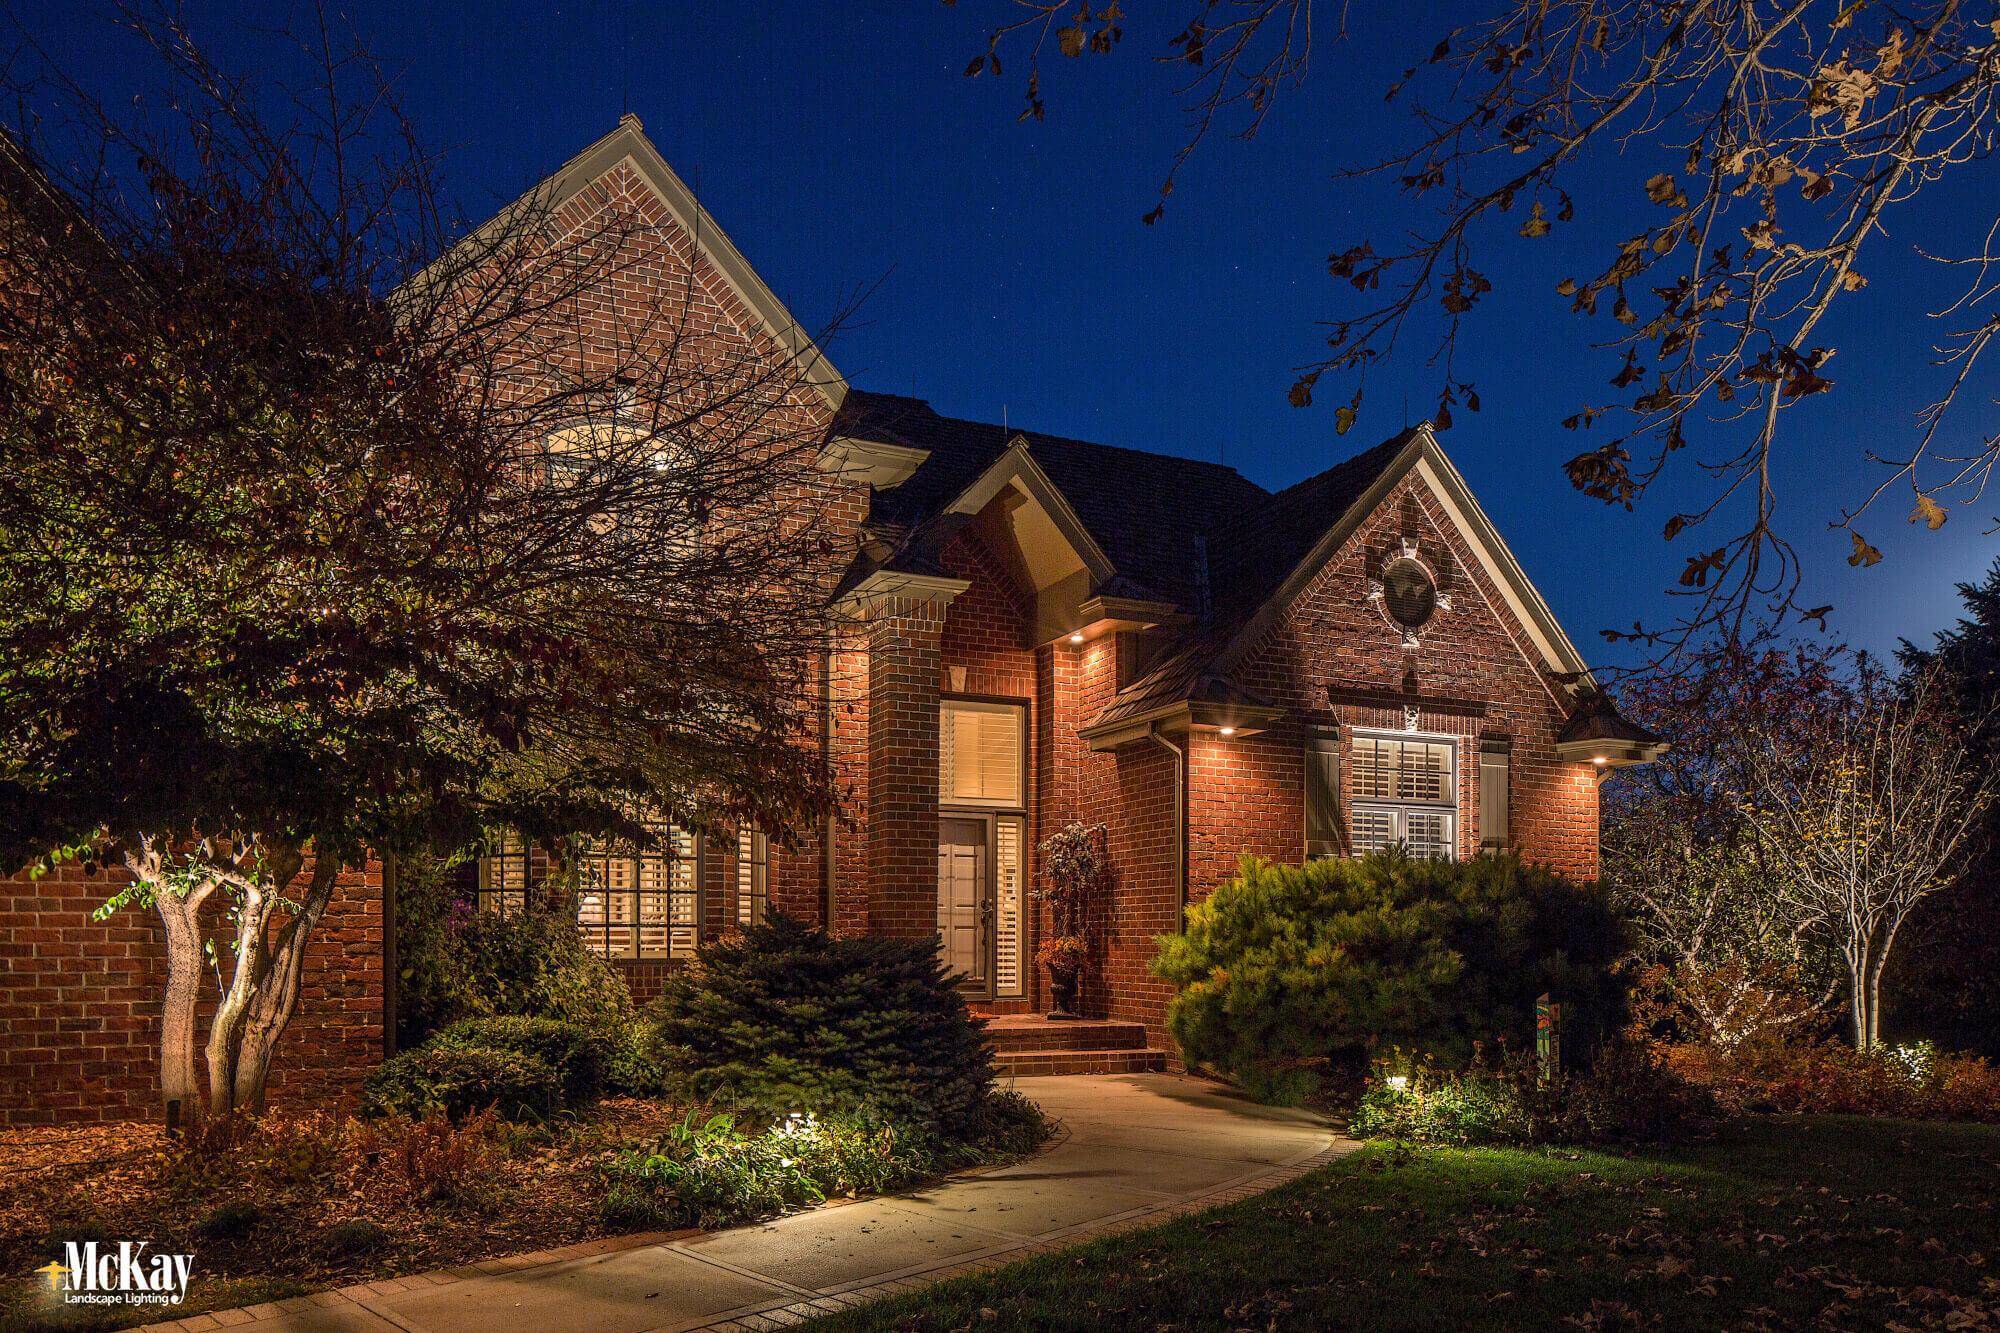 Landscape Lighting LED Upgrade Omaha Nebraska